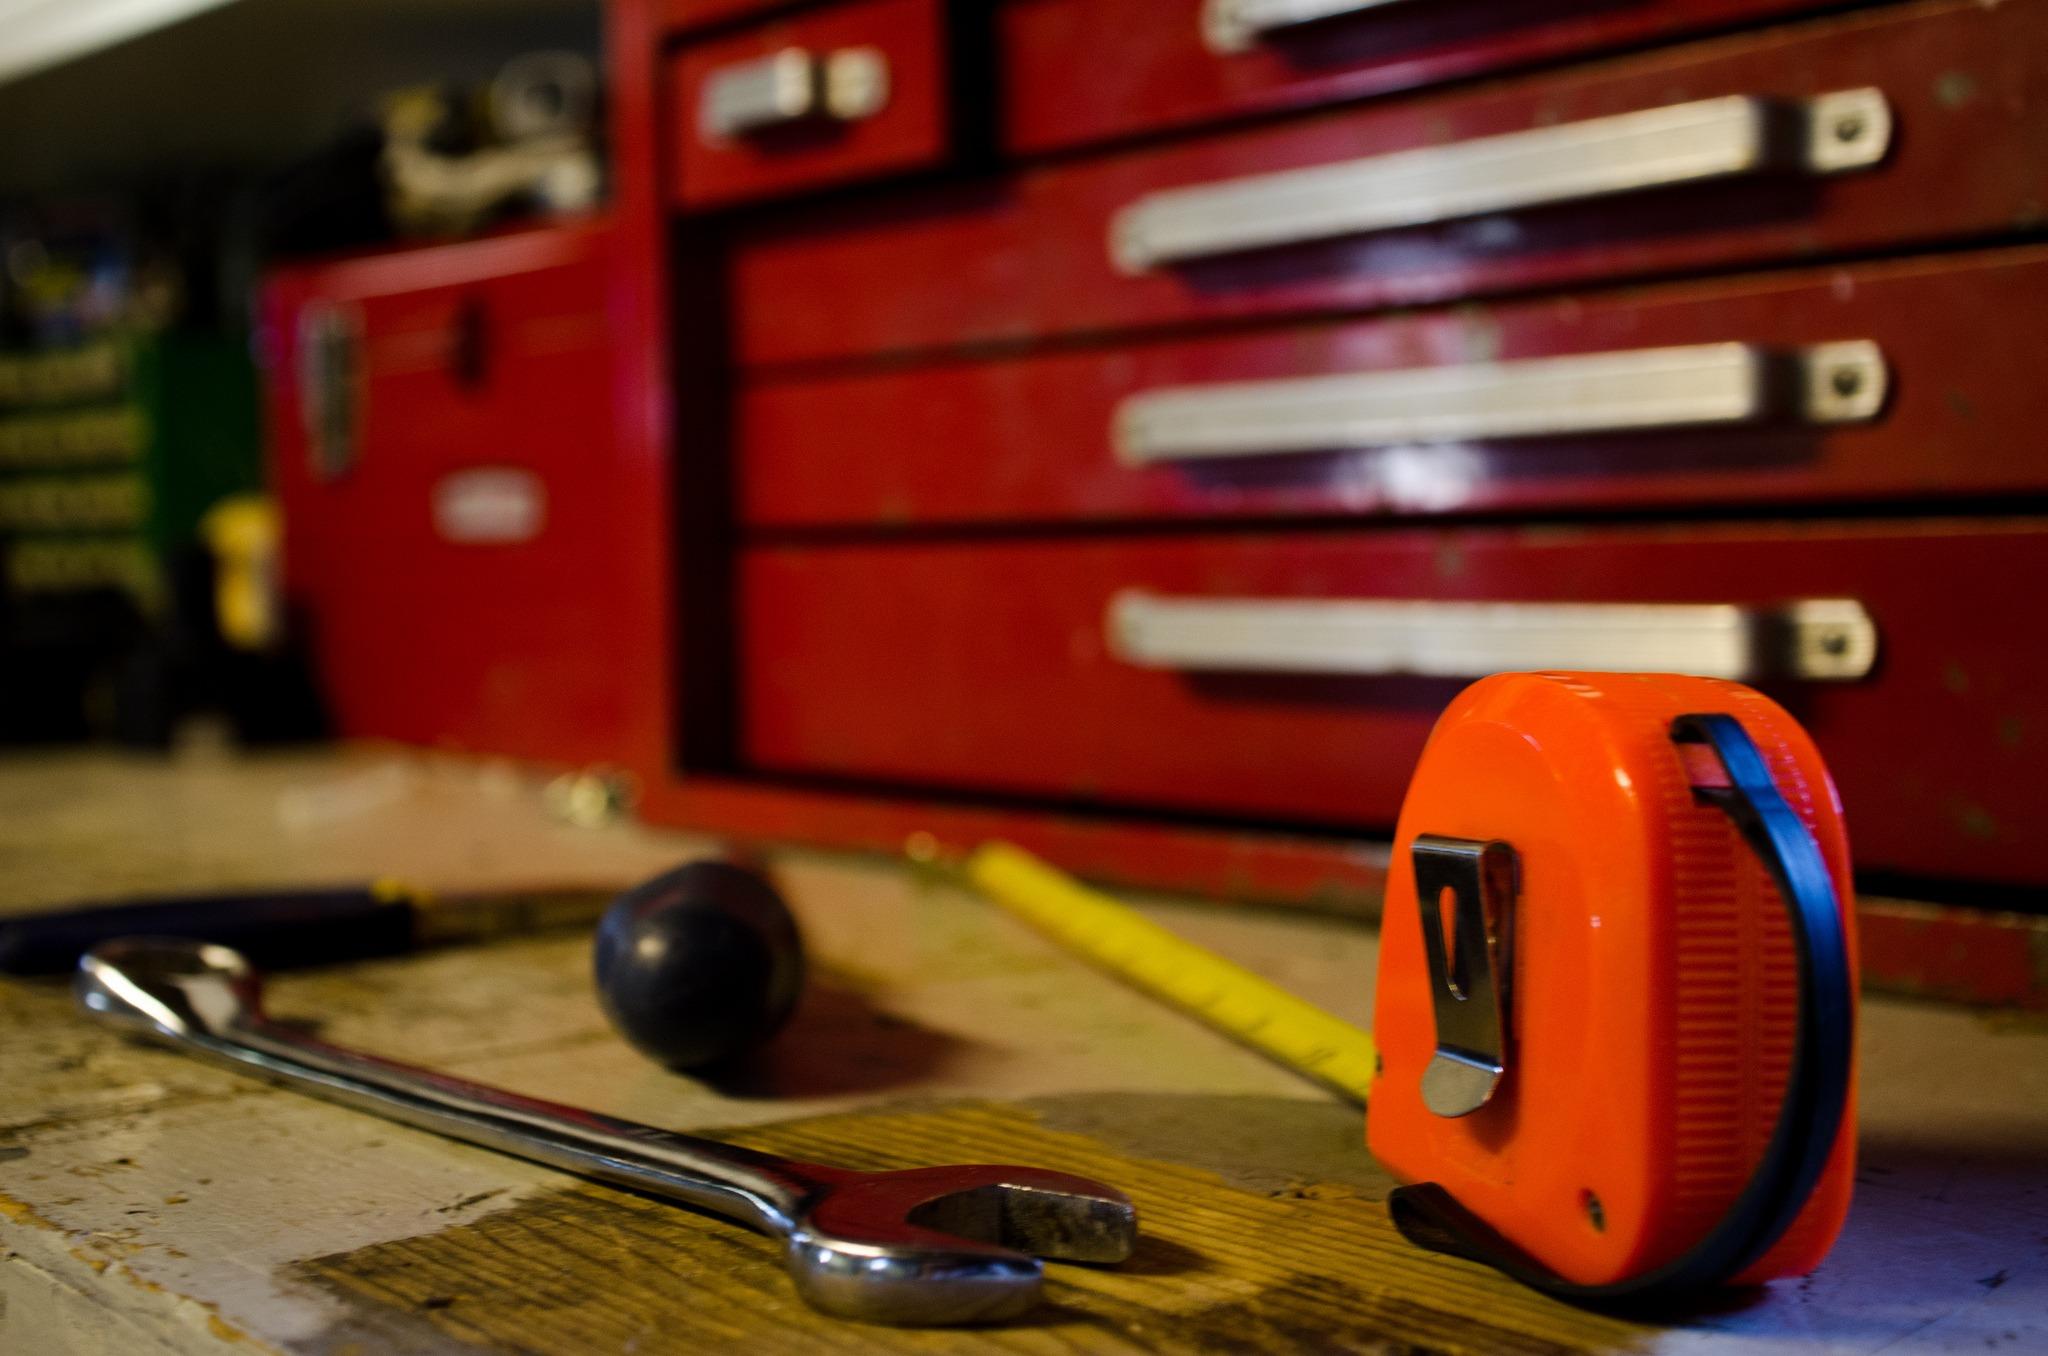 Zece unelte indispensabile oricărei gospodării. Foto: Julien Dumont / Flickr